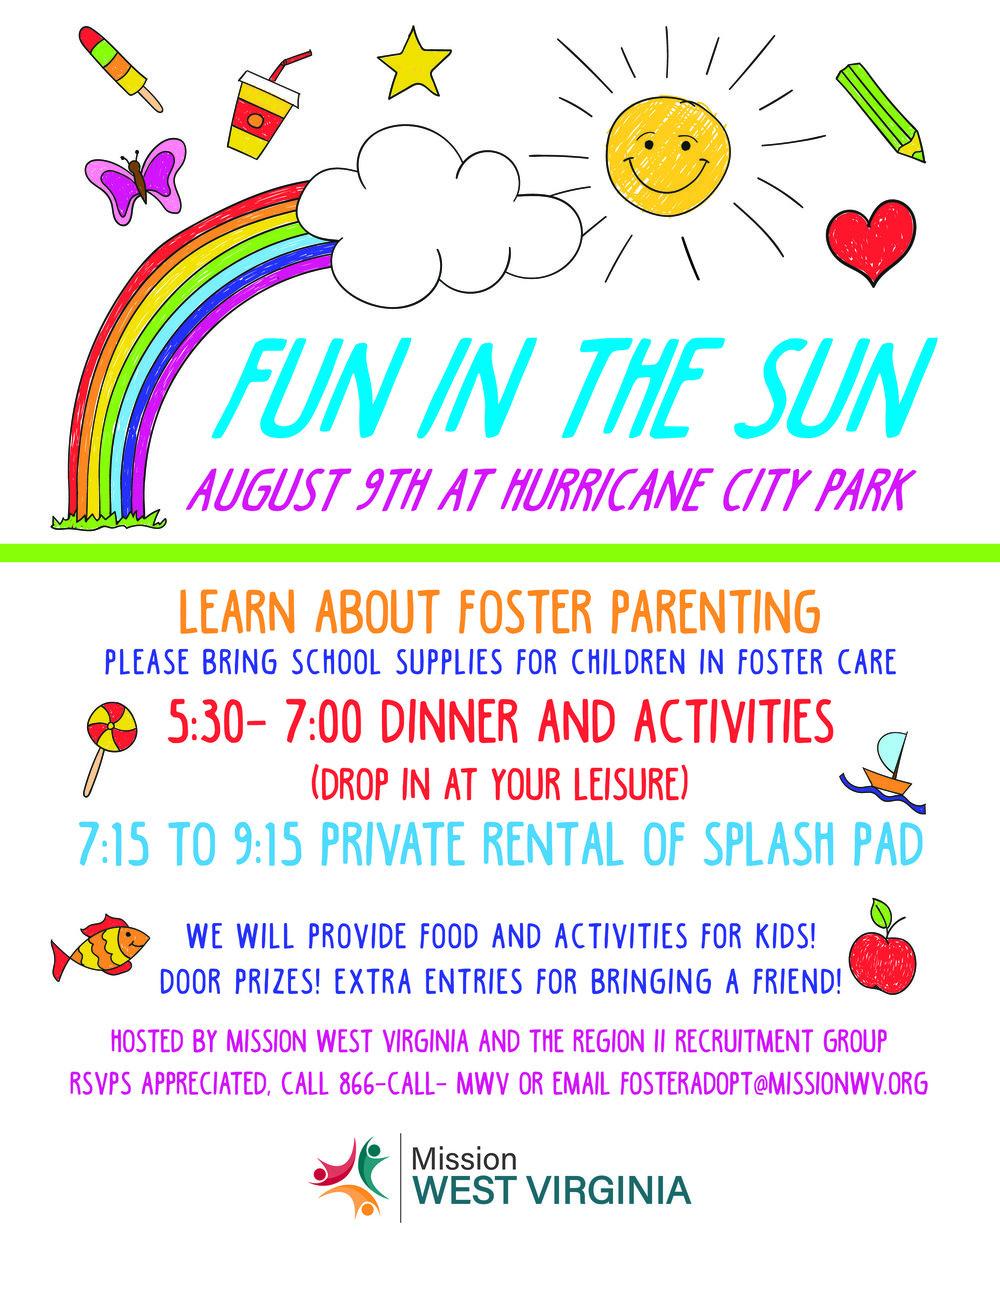 Hurricane city park event AUG 2018 (1) (1).jpg